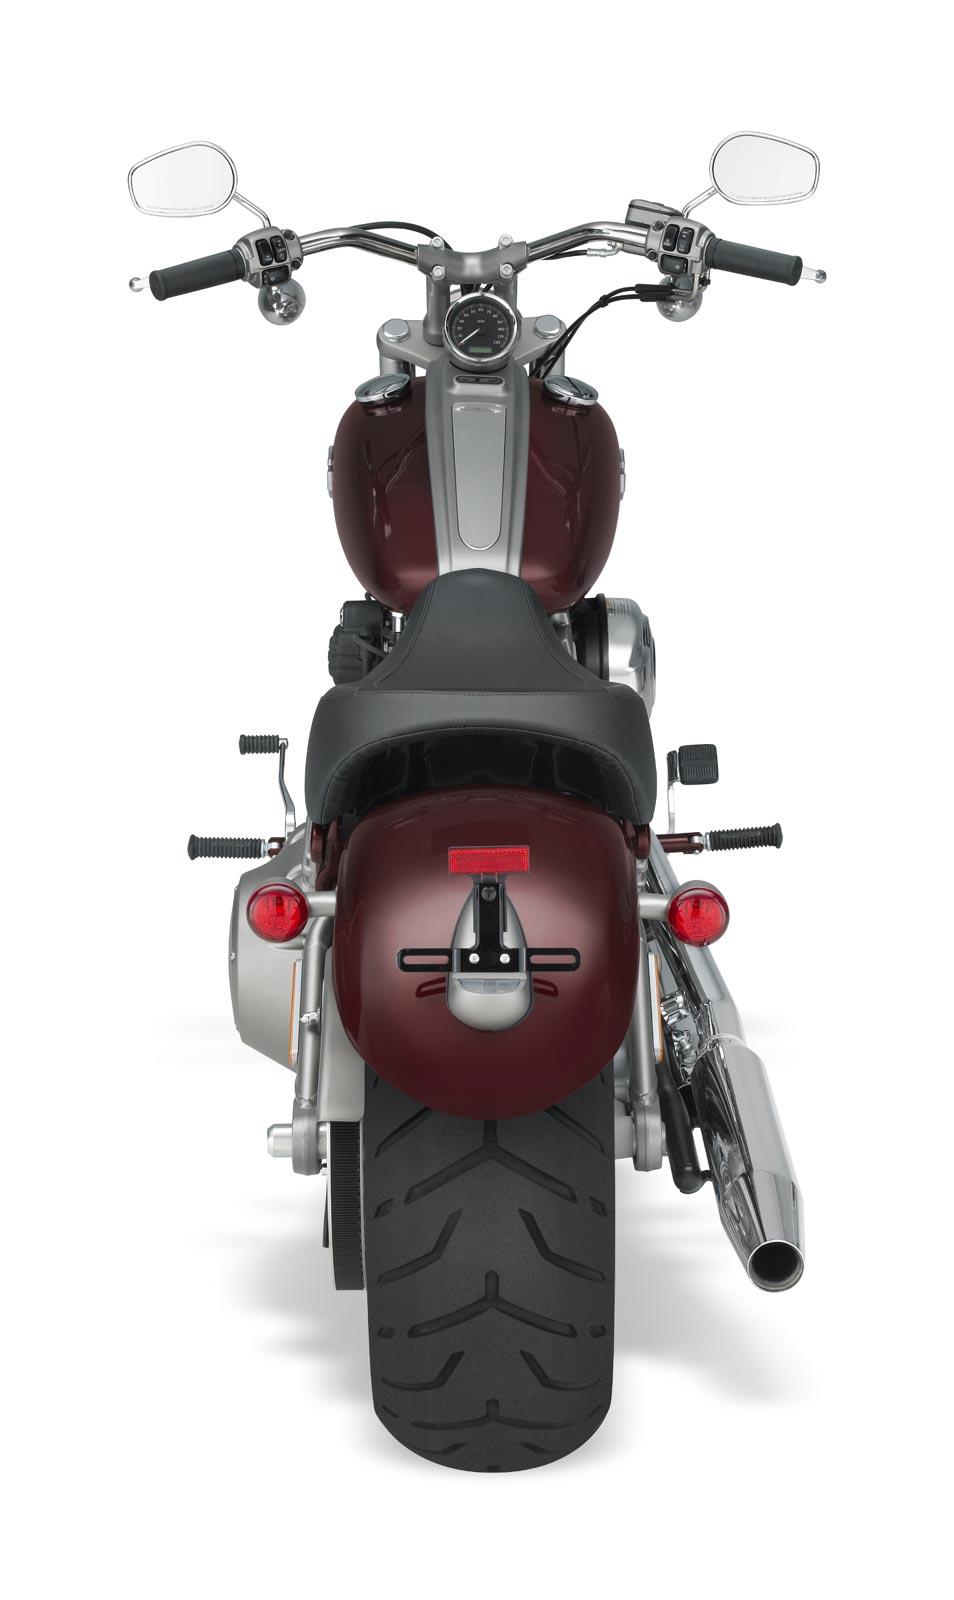 Harley Davidson Rocker Specs - 2007  2008